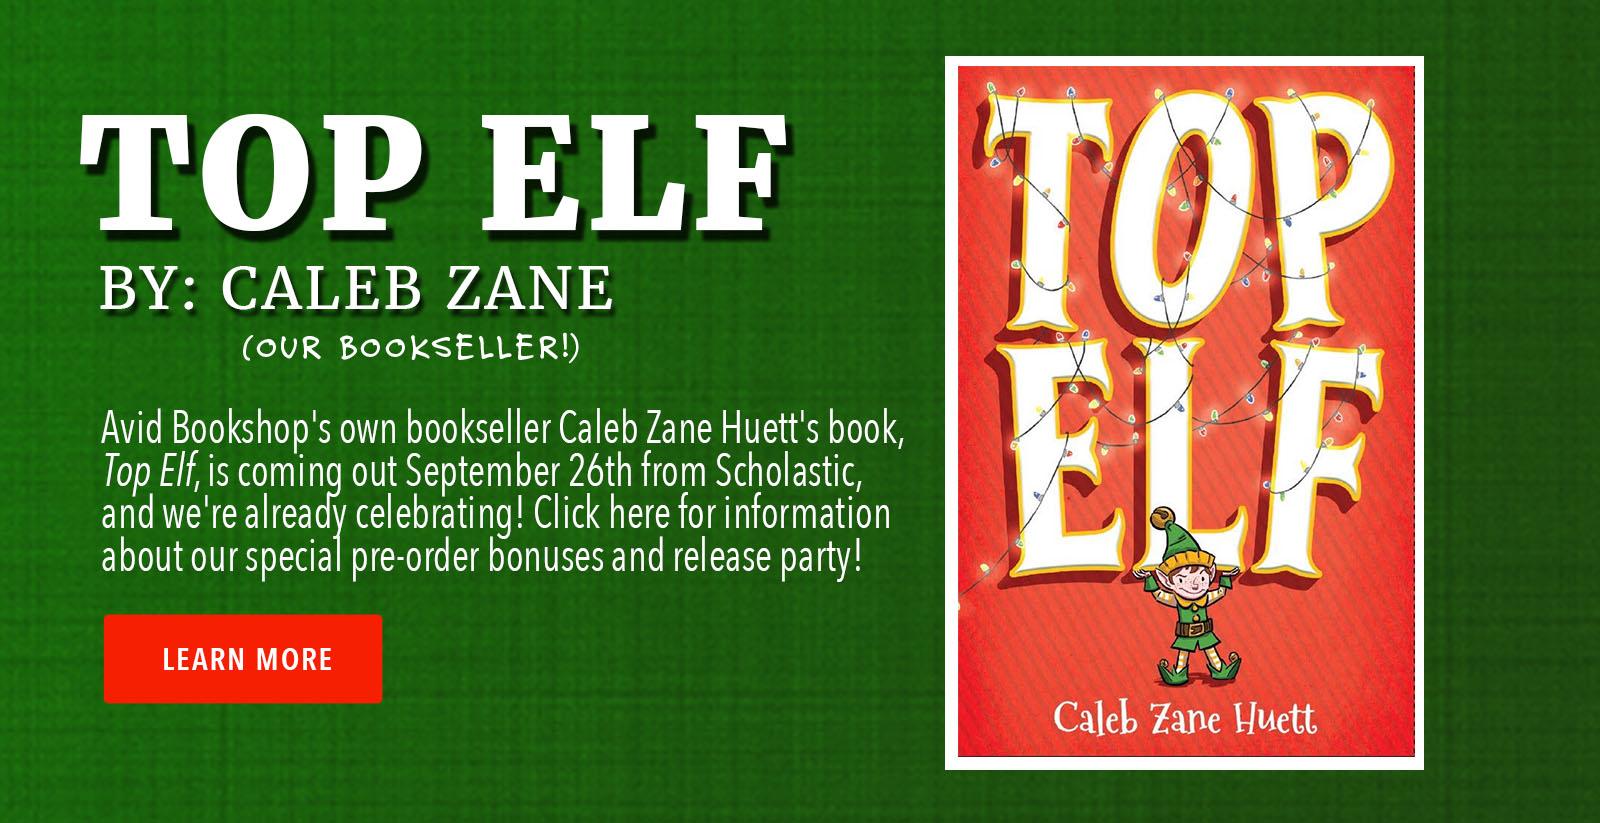 Top Elf by Caleb Zane